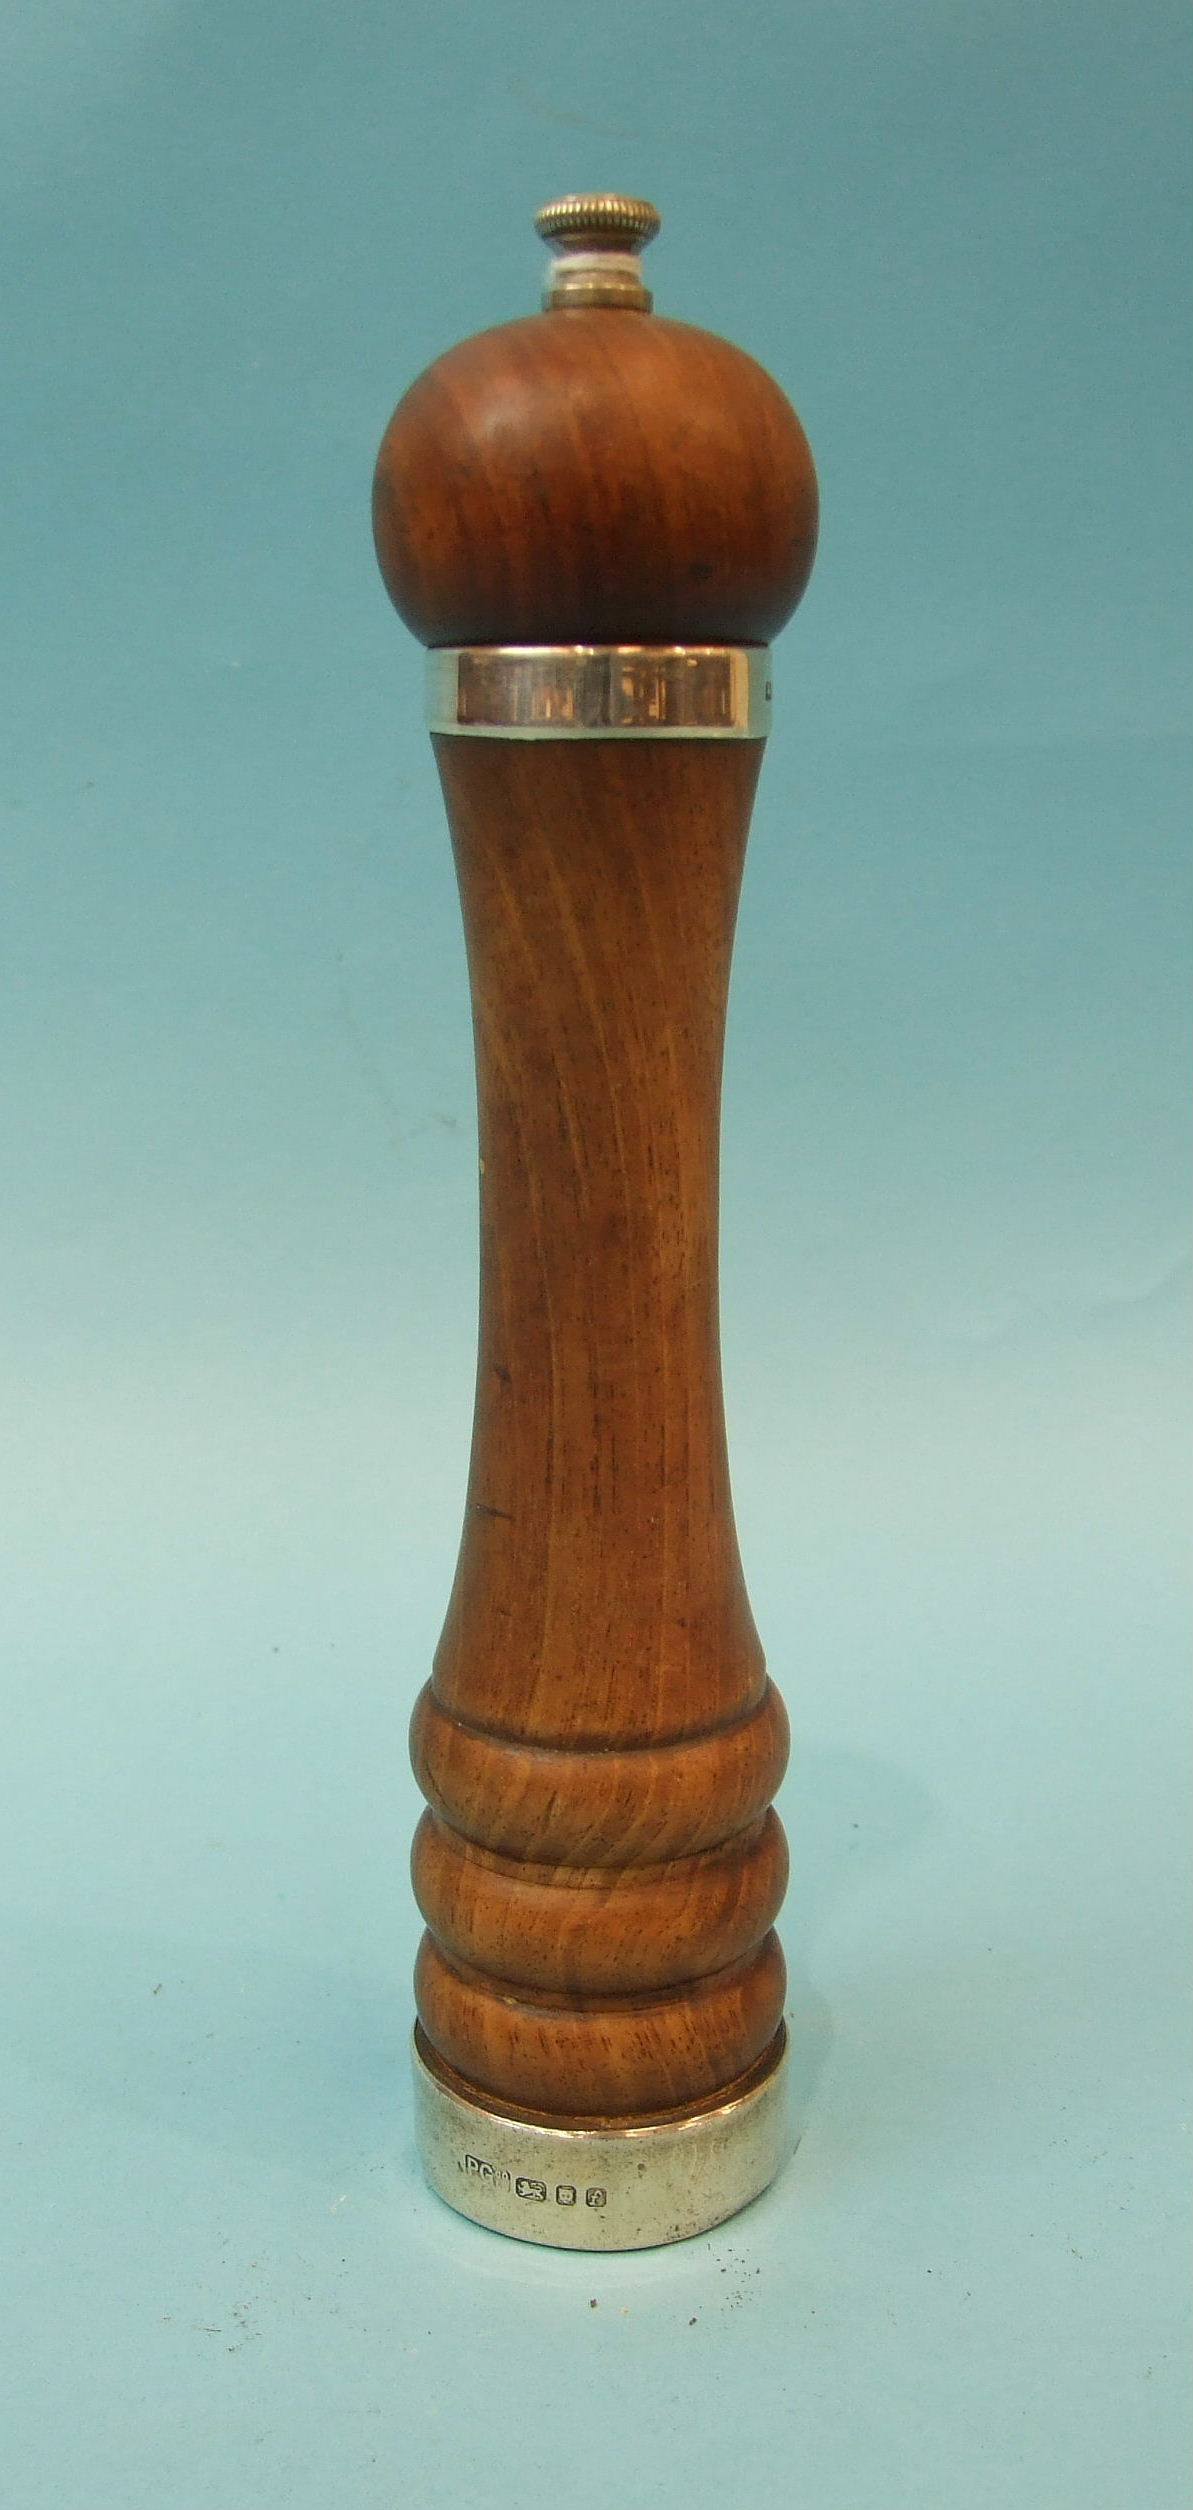 Lot 338 - A modern silver-mounted walnut pepper grinder, maker Park Green & Co, Ltd, London 1961, 23cm.